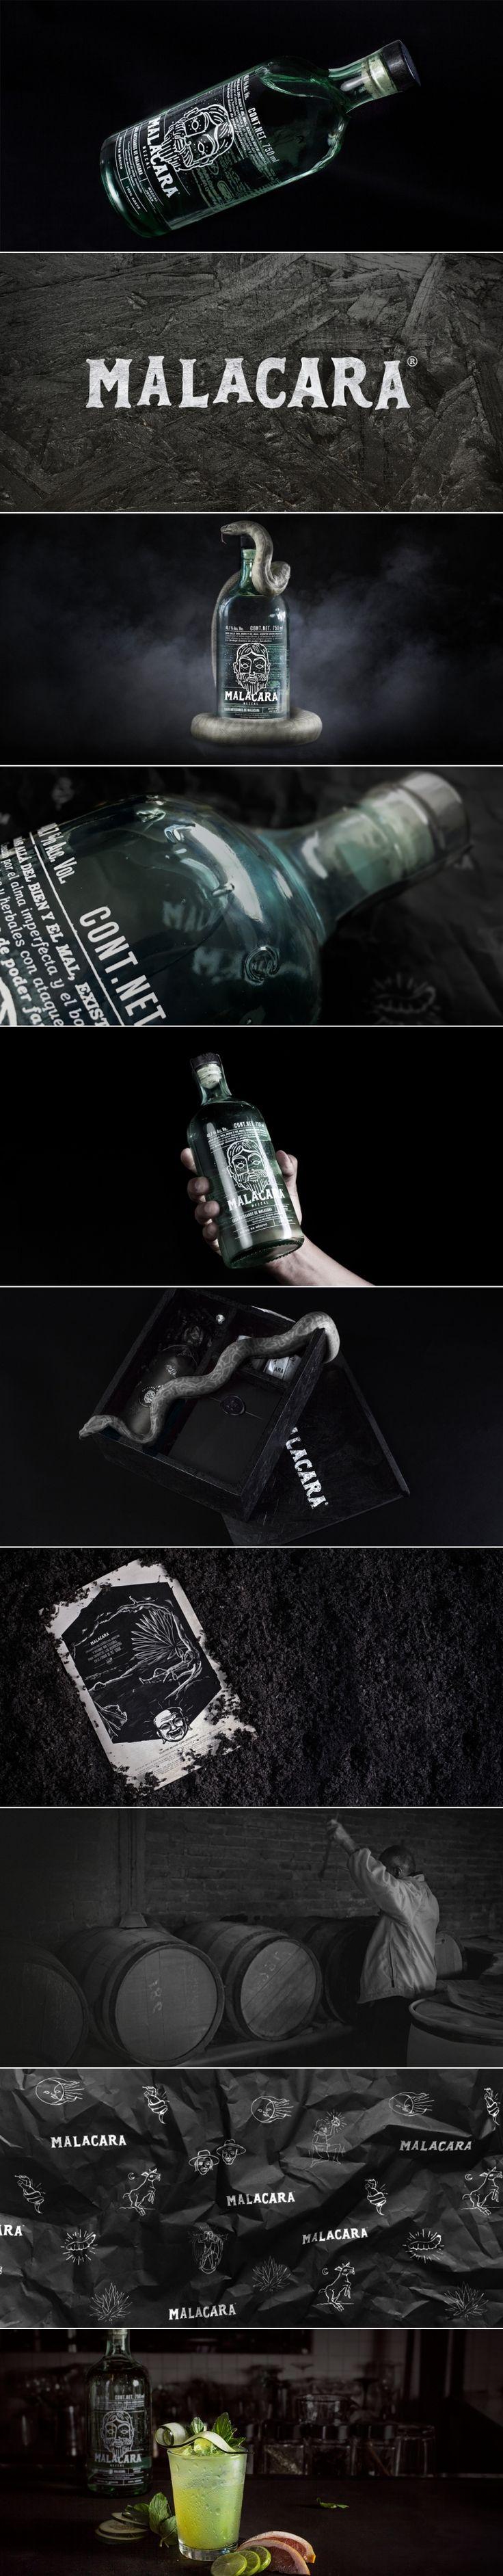 Malacara Mezcal — The Dieline | Packaging & Branding Design & Innovation News